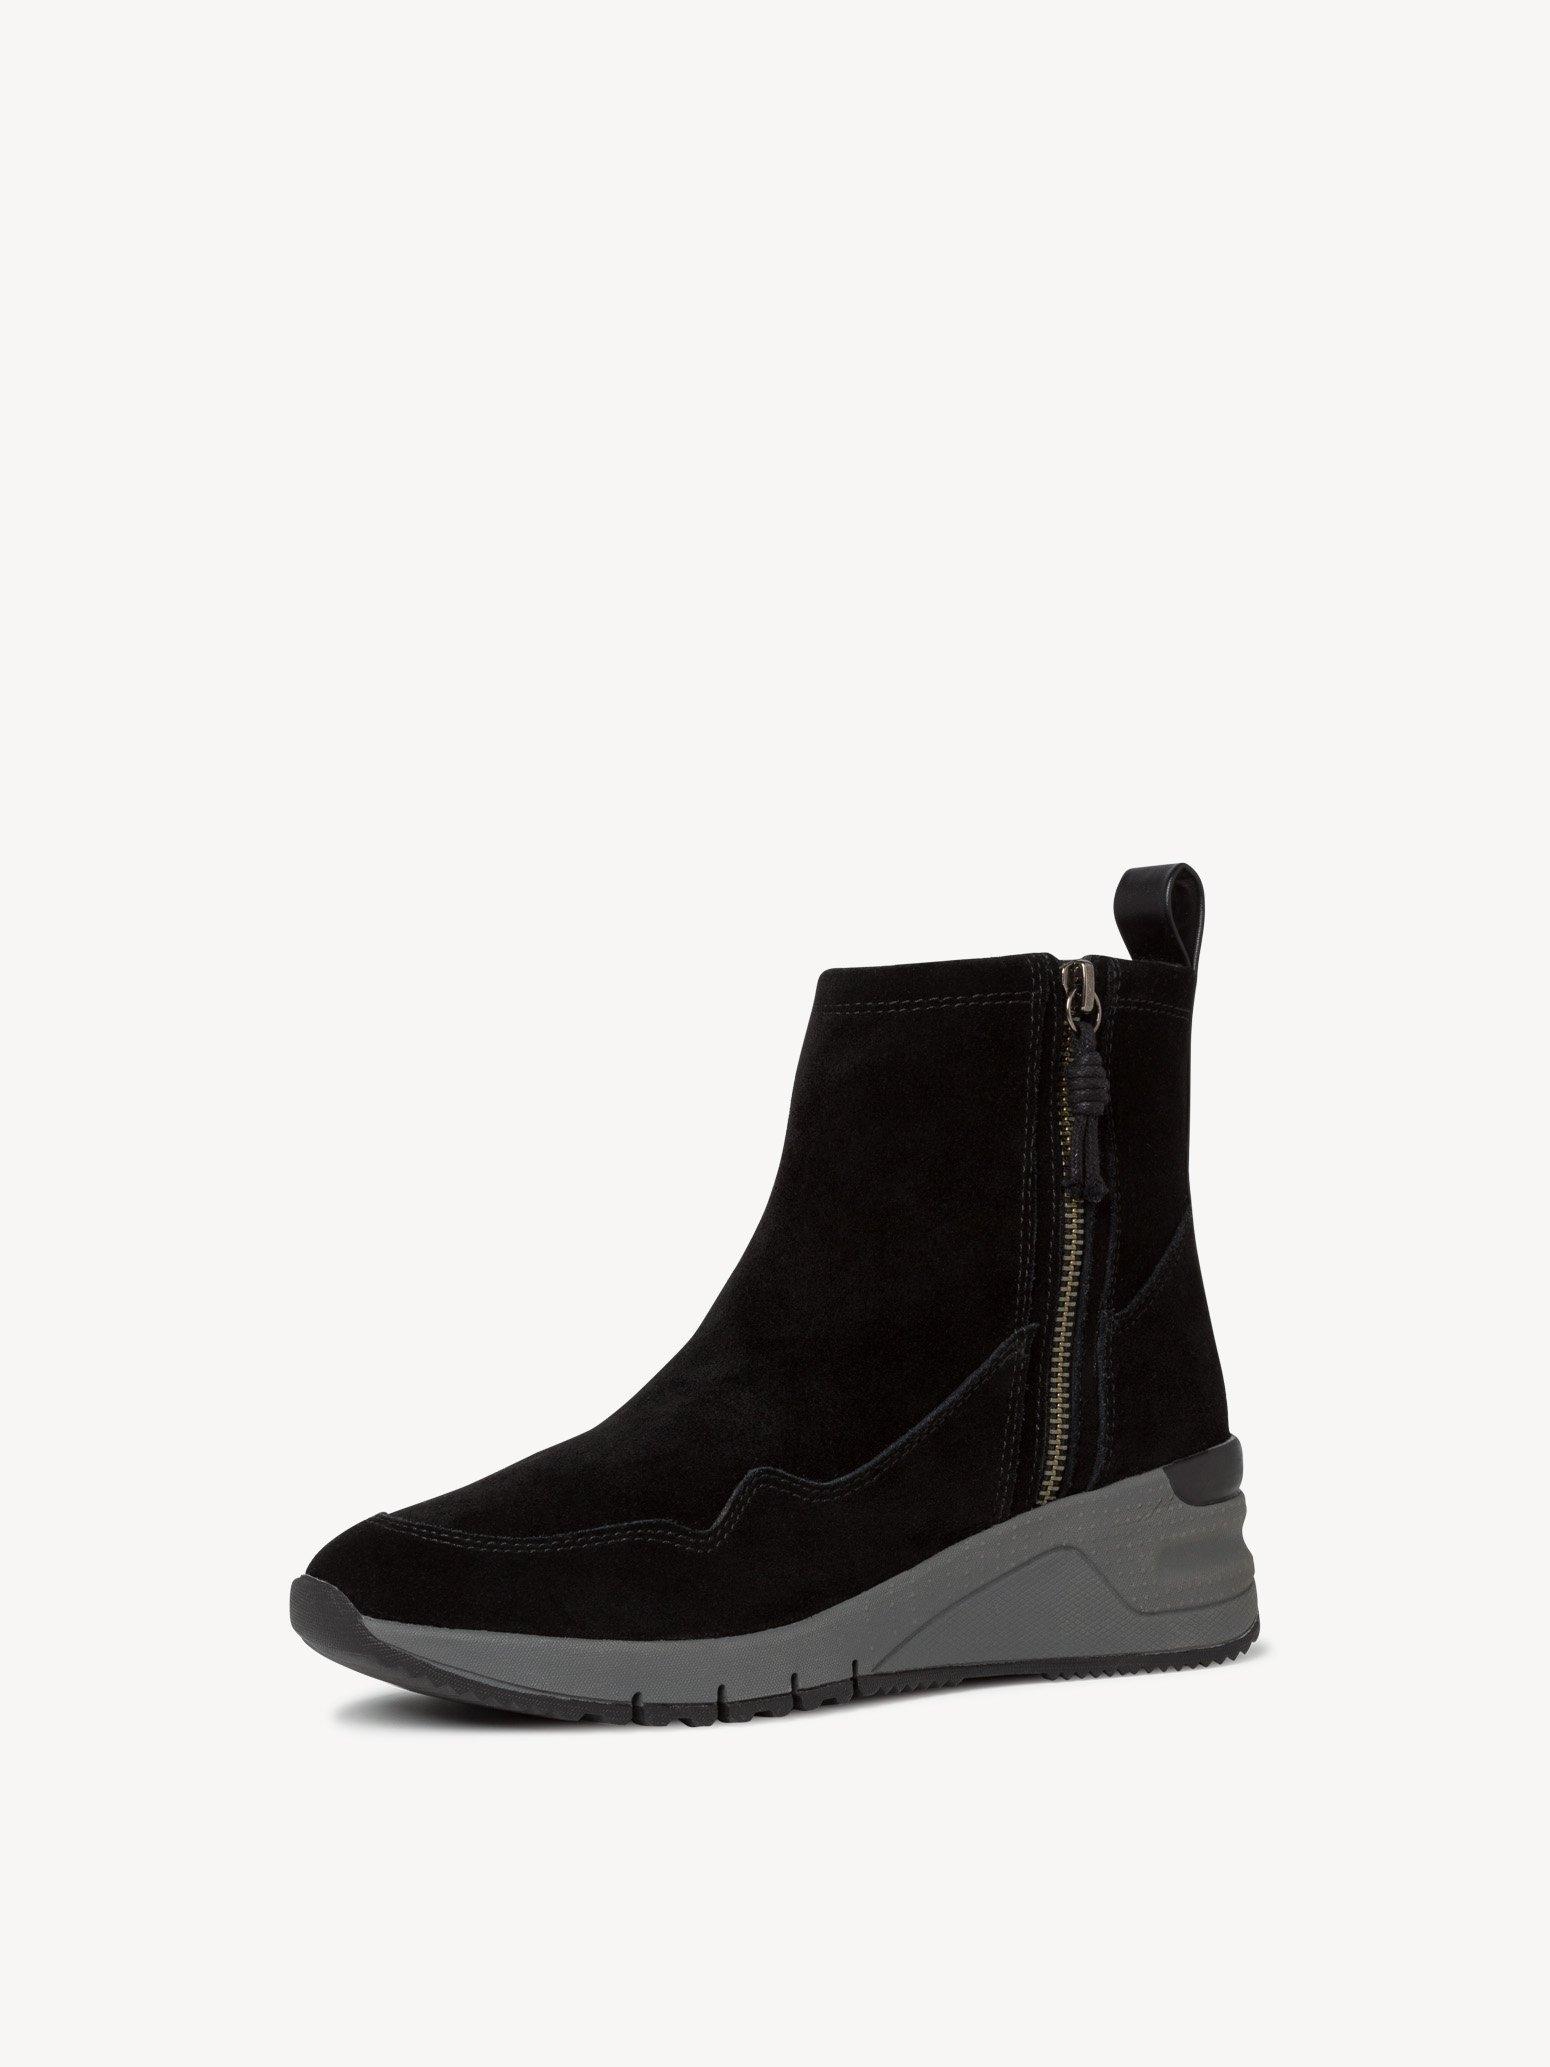 Ботинки Tamaris 1-1-25428-25-001